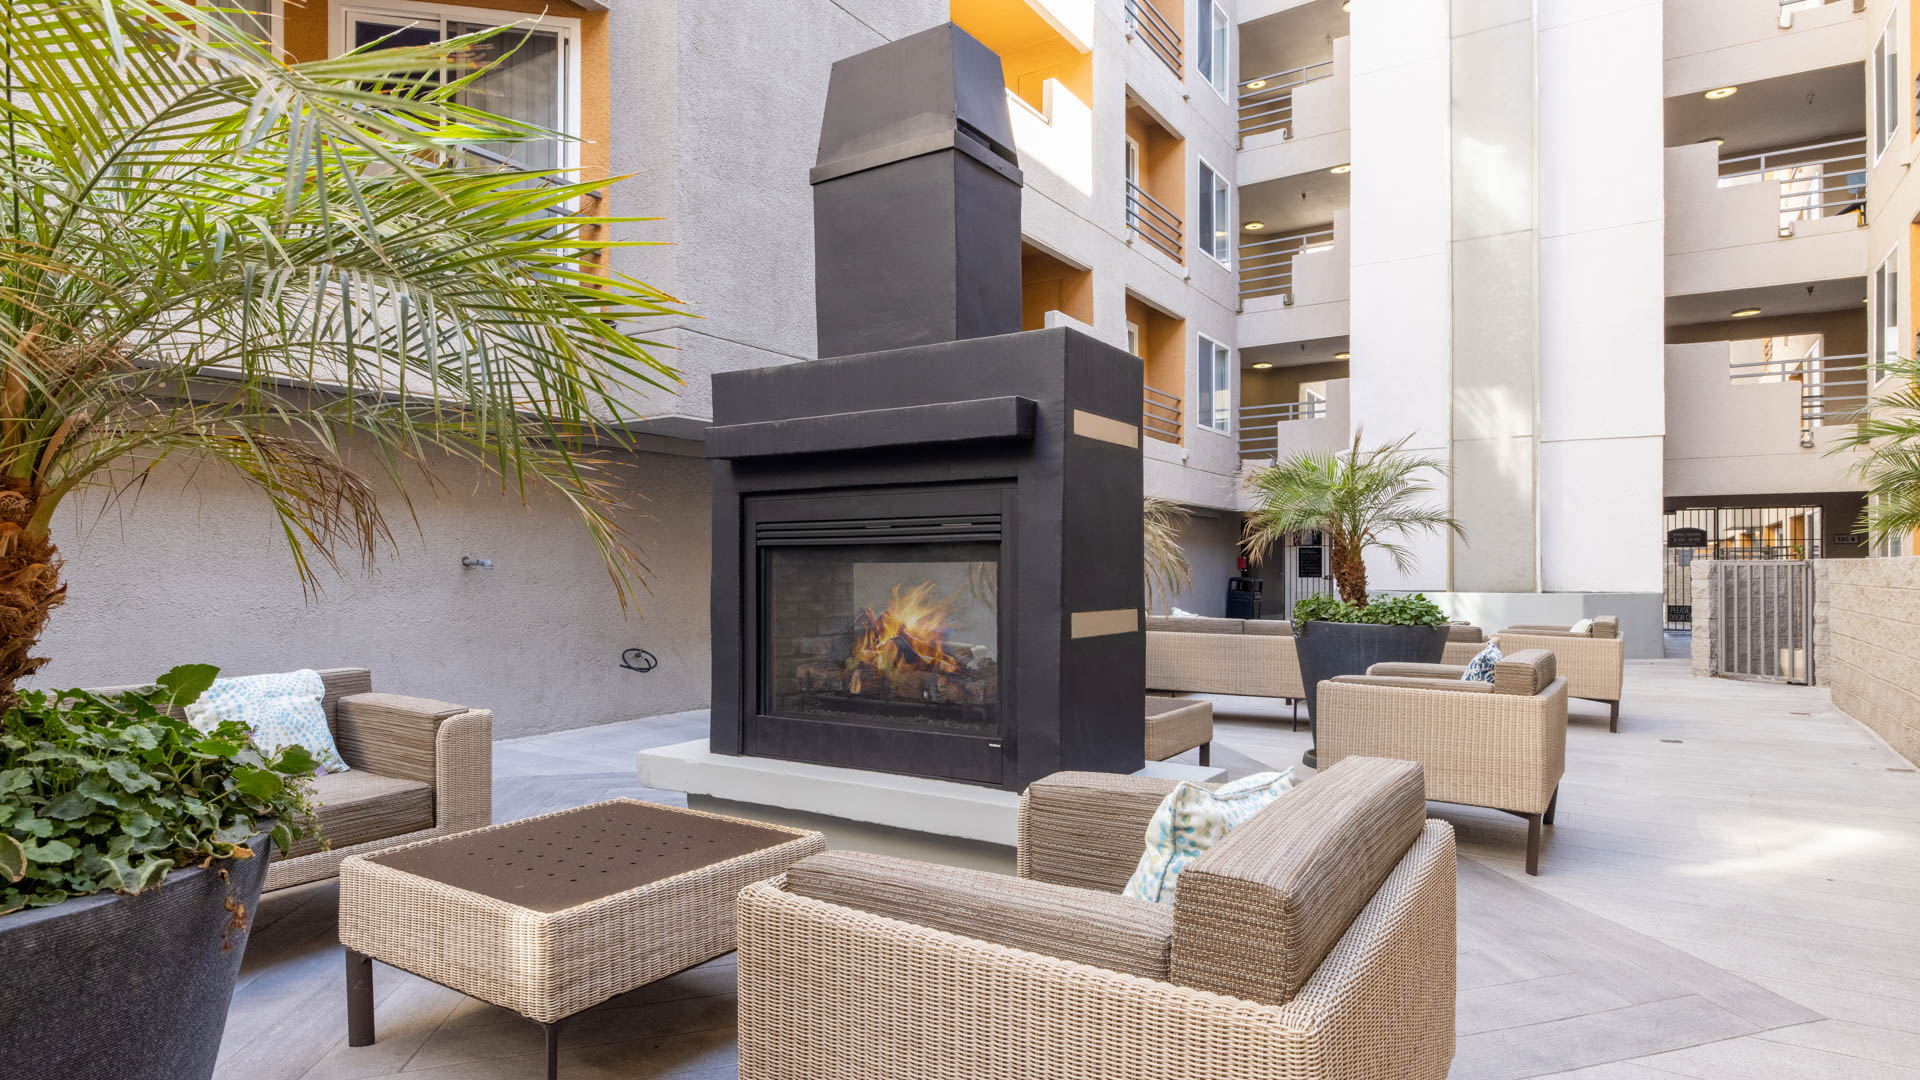 Vantage Hollywood Apartments - Courtyard